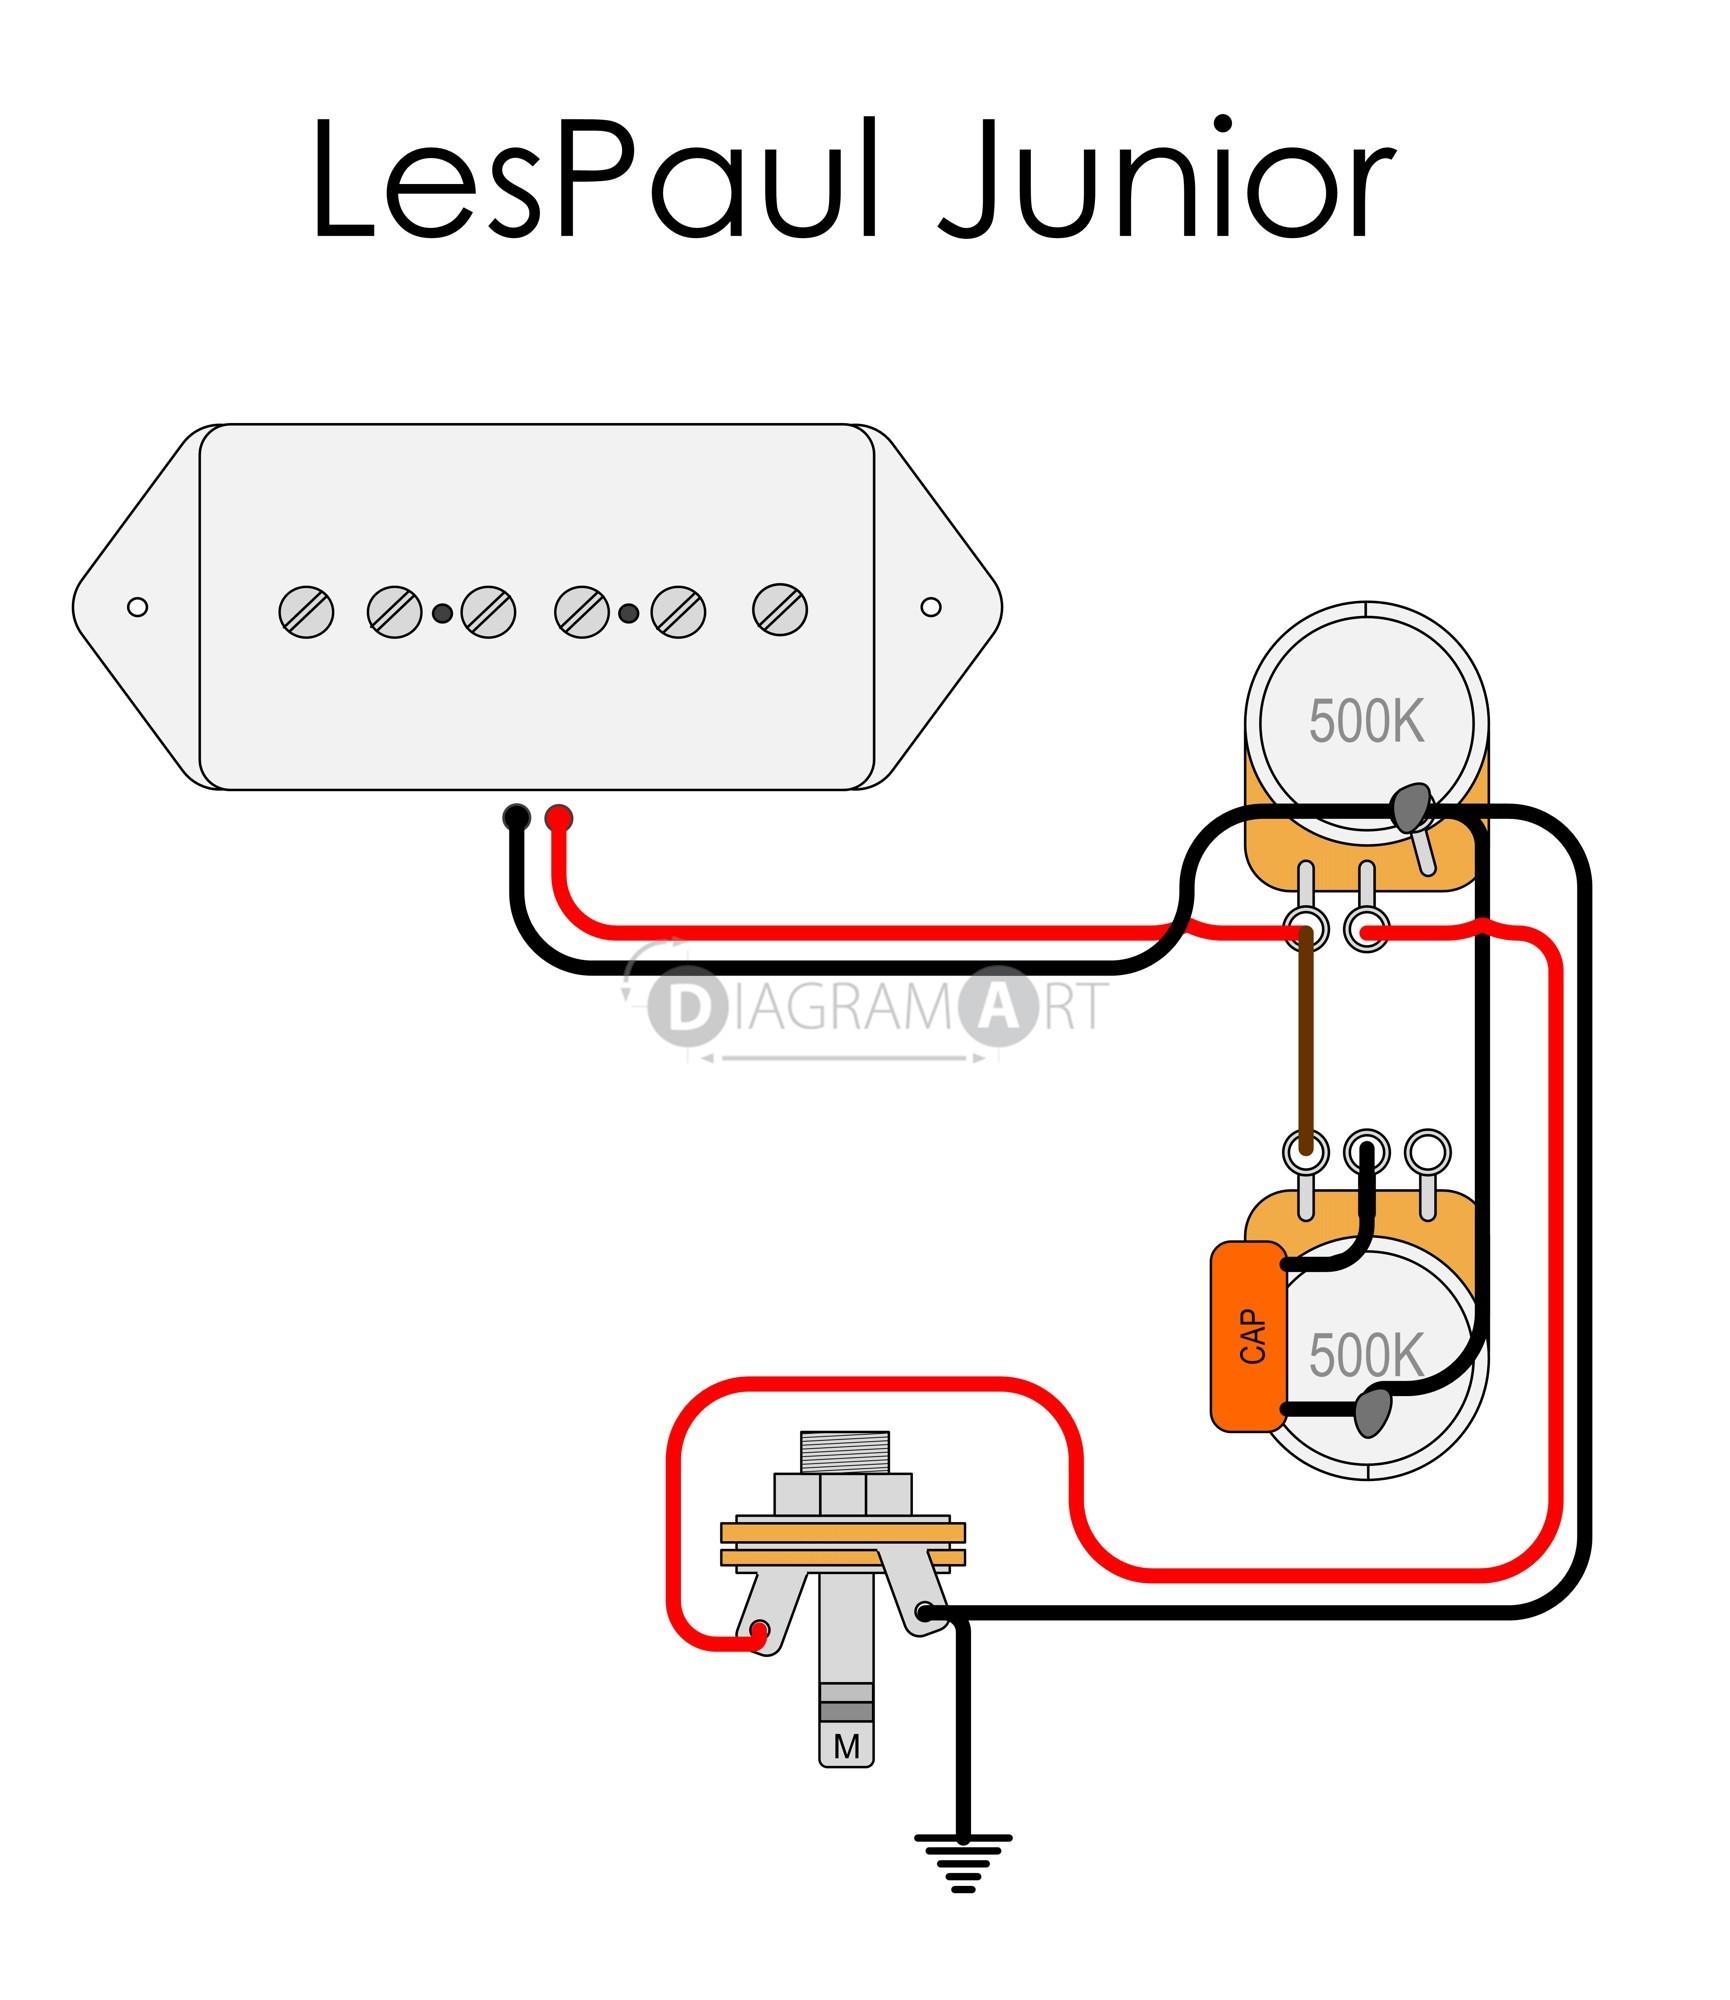 Astonishing Wiring Diagram For Les Paul Wiring Library Wiring Cloud Loplapiotaidewilluminateatxorg